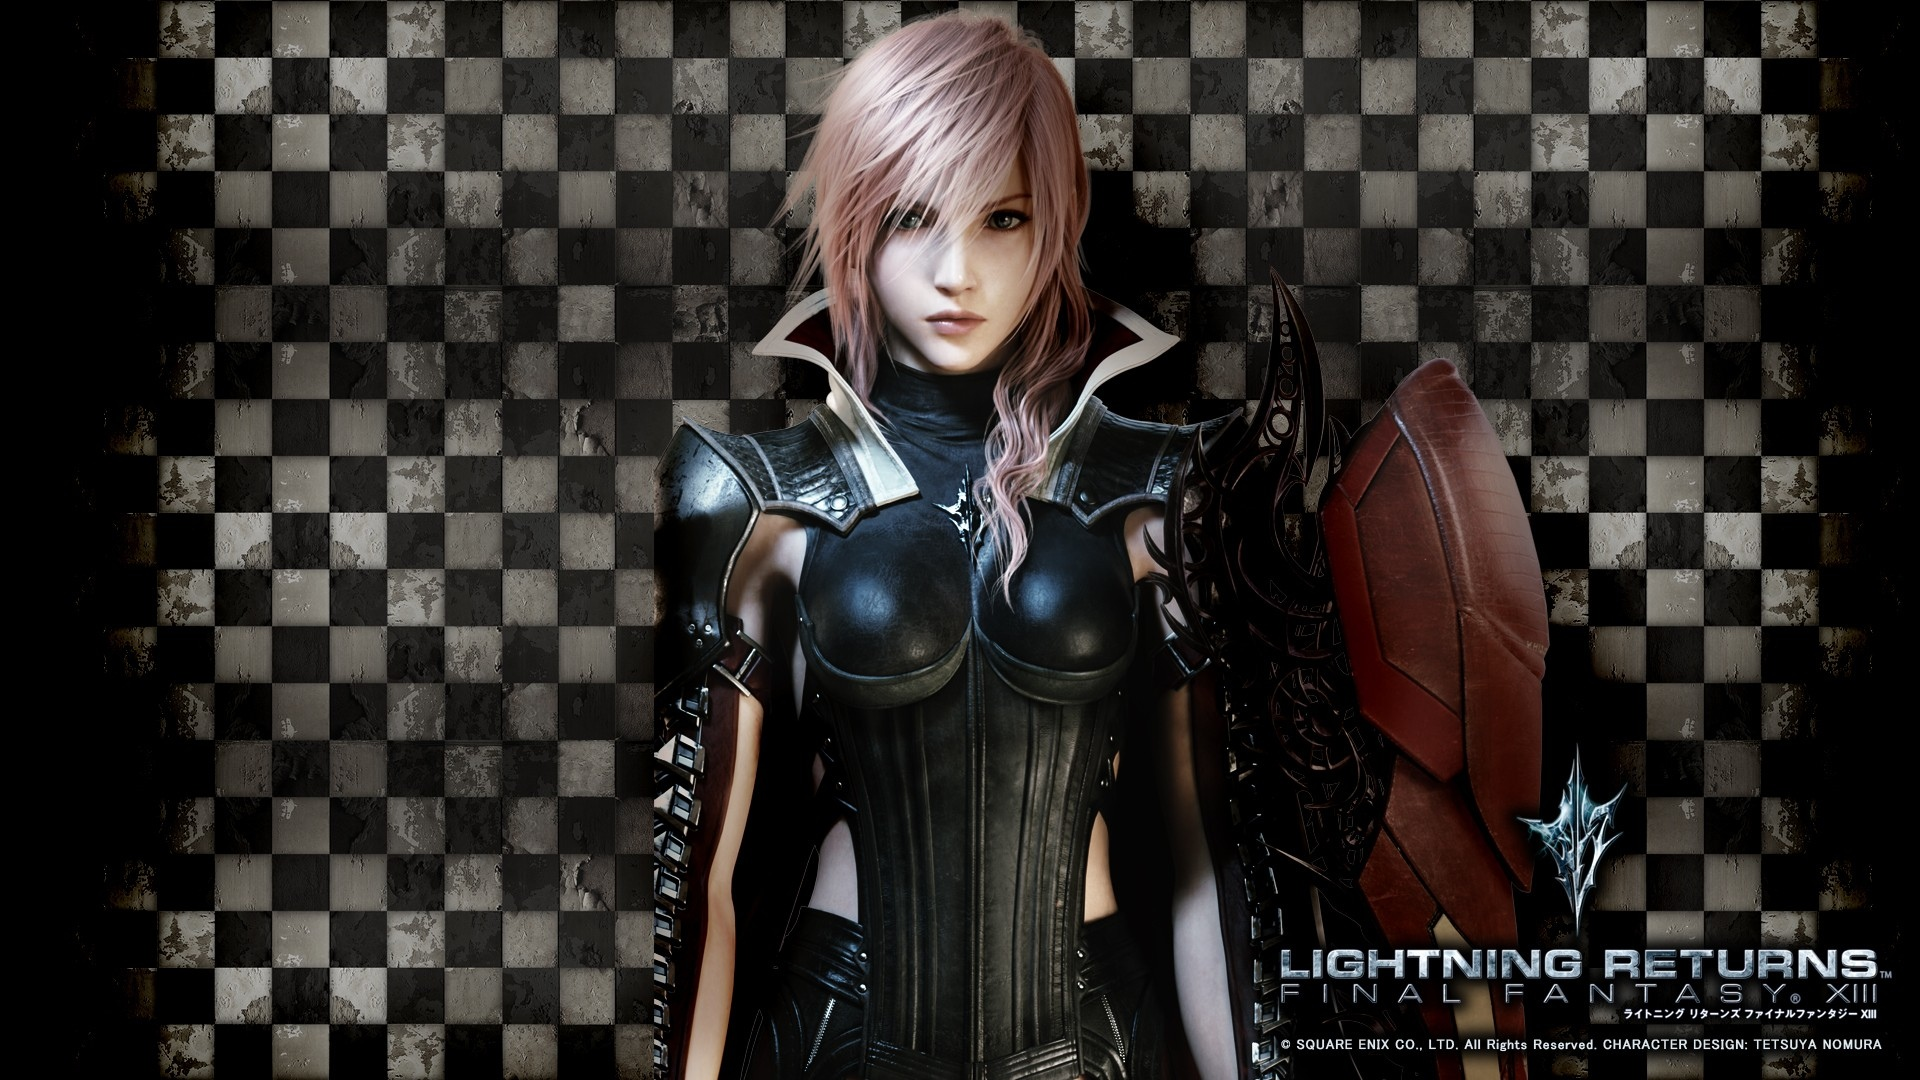 final fantasy xiii lightning returns on Tumblr